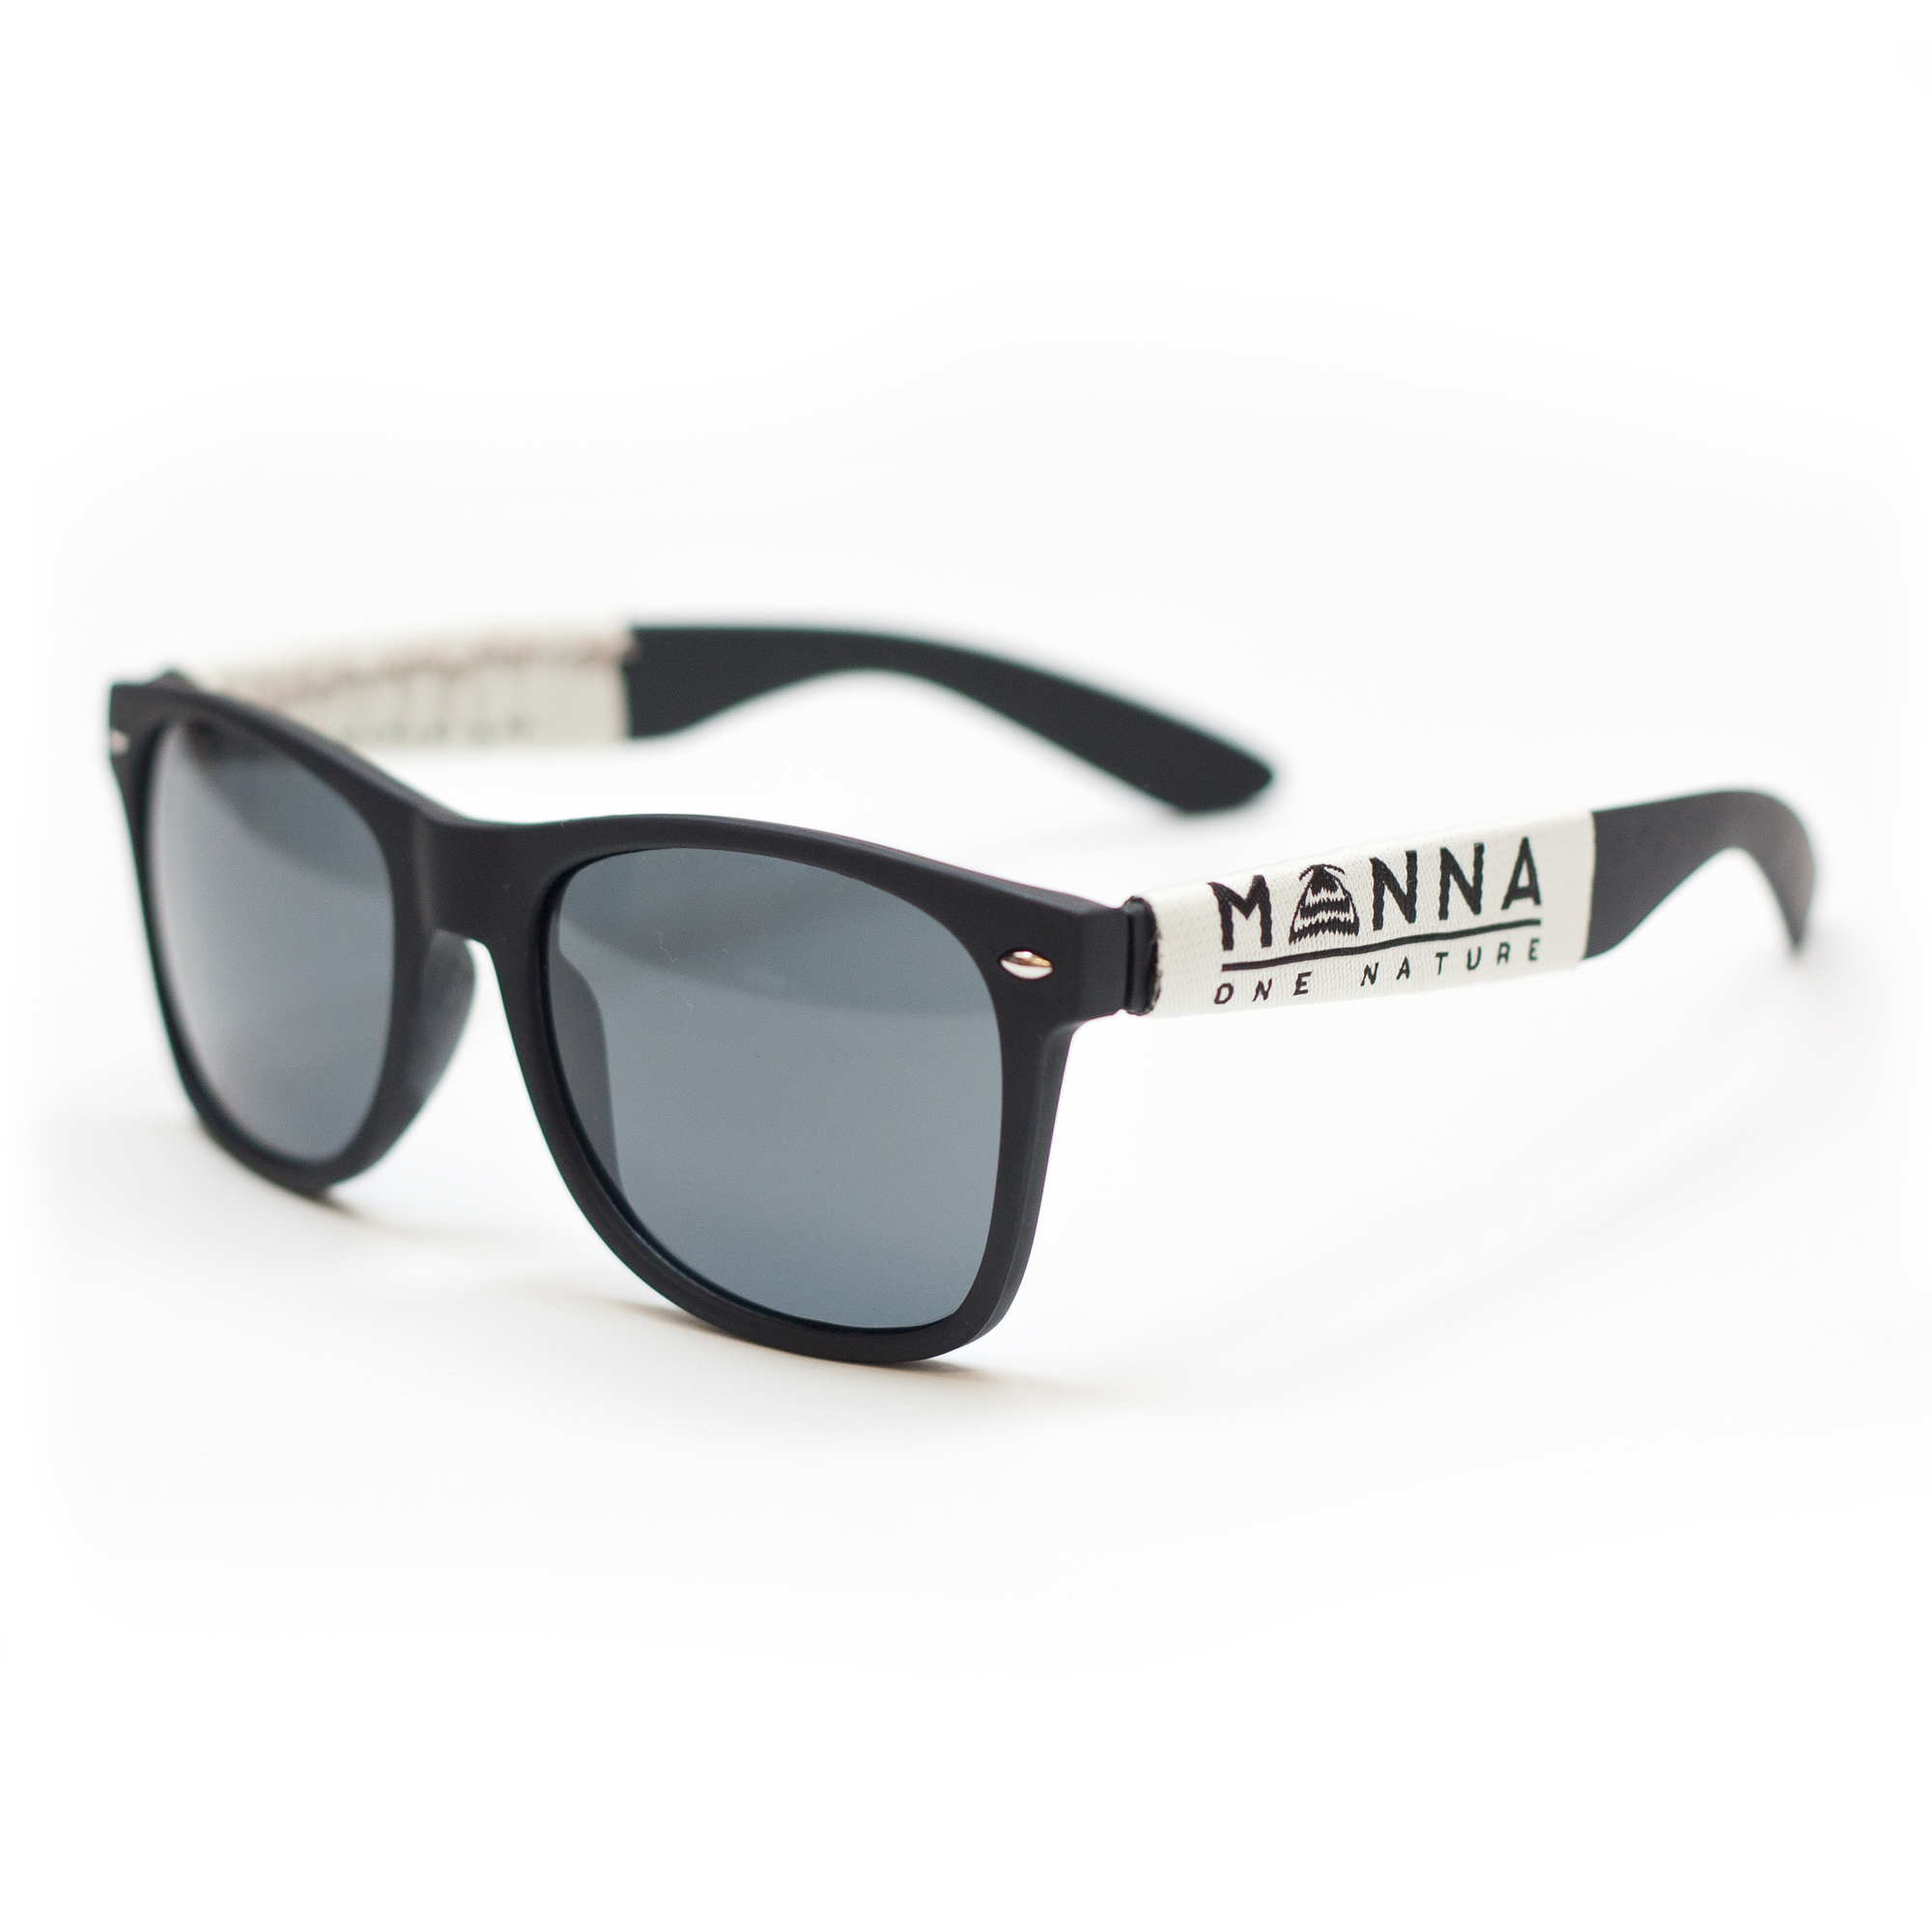 One Nature Sunglasses - 1